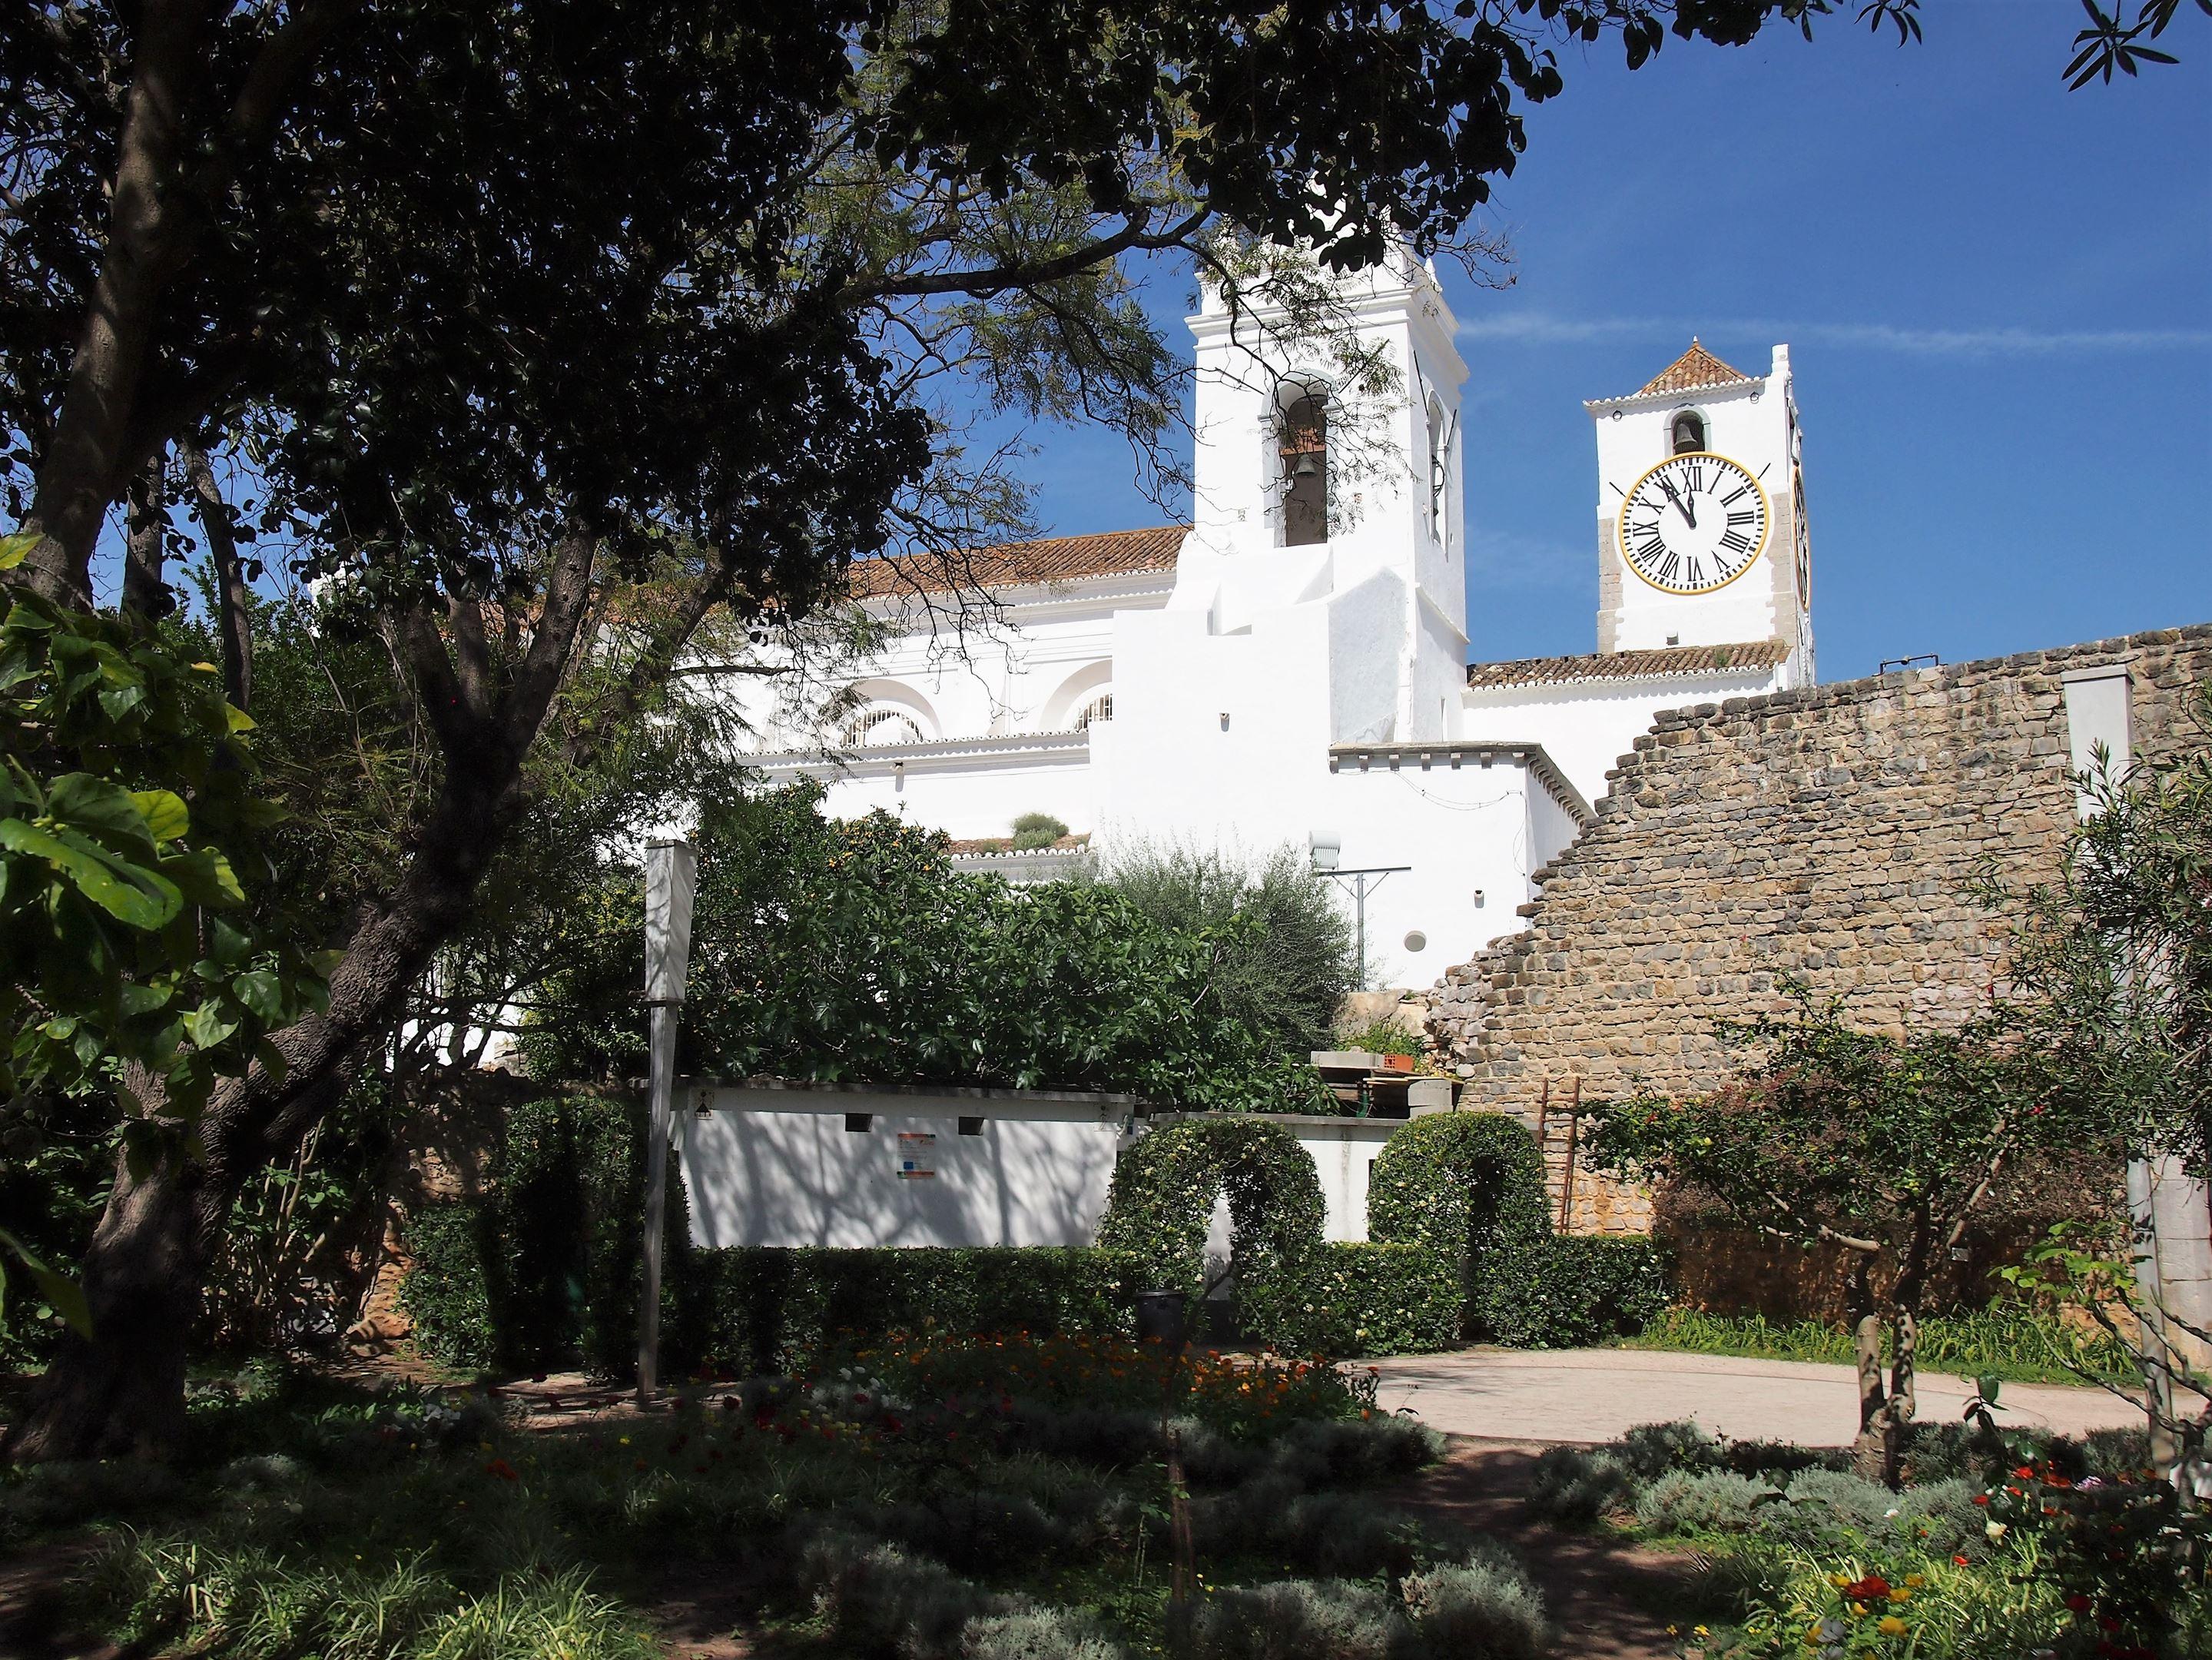 Igreja de Santa Maria do Castelo, l'église de Santa Maria, près des ruines du château de Tavira.